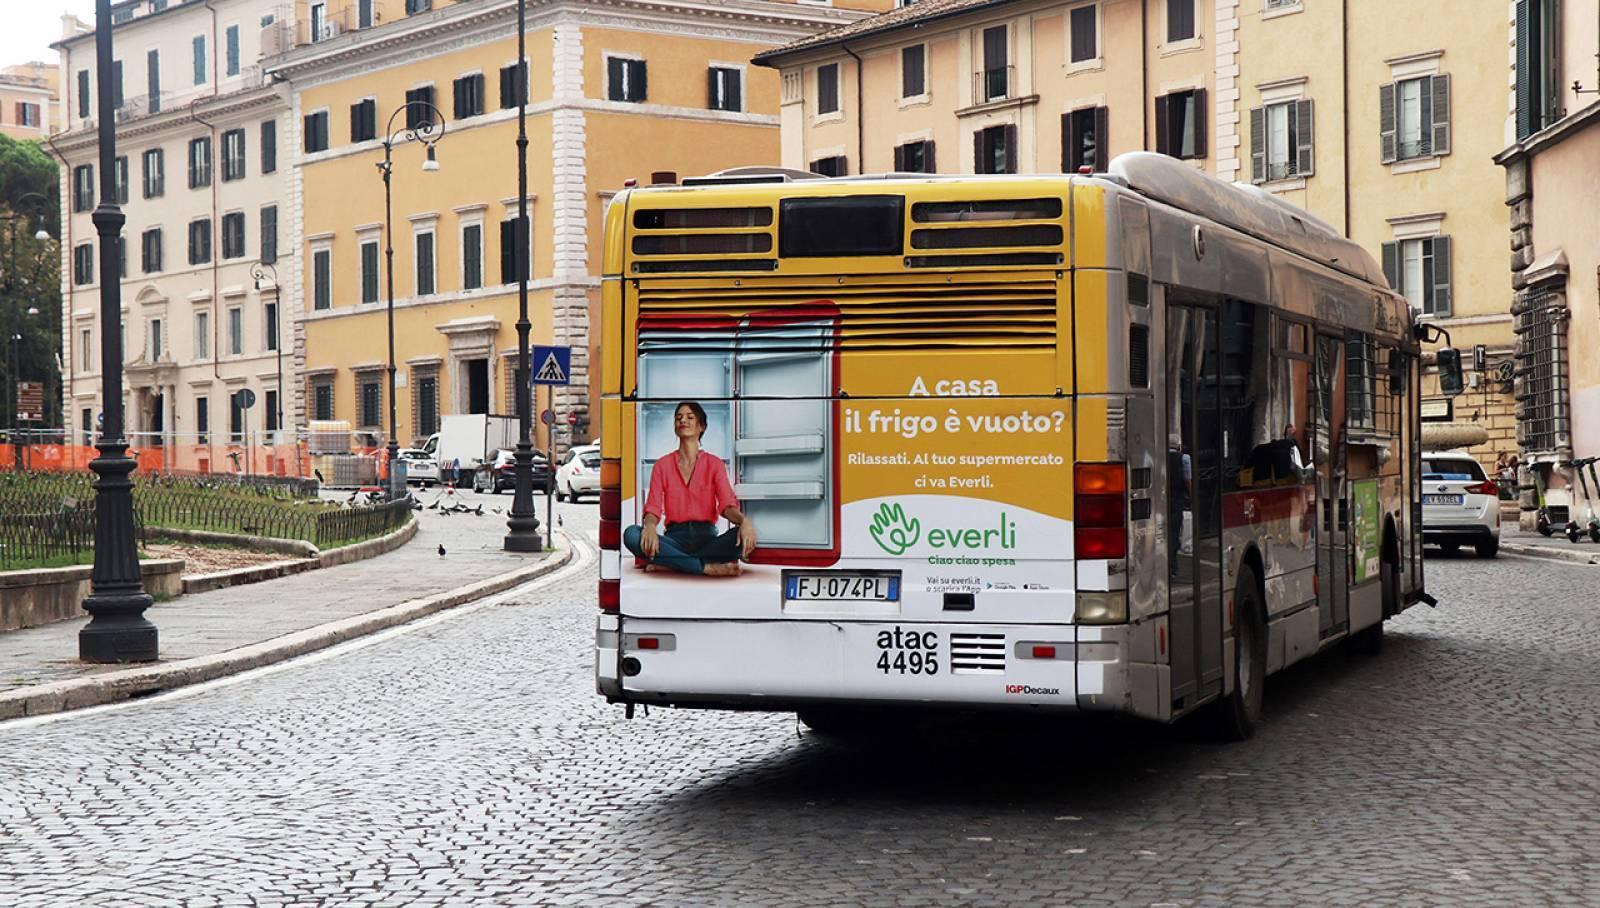 Pubblicità Out of Home a Roma IGPDecaux Full-Back per Everli